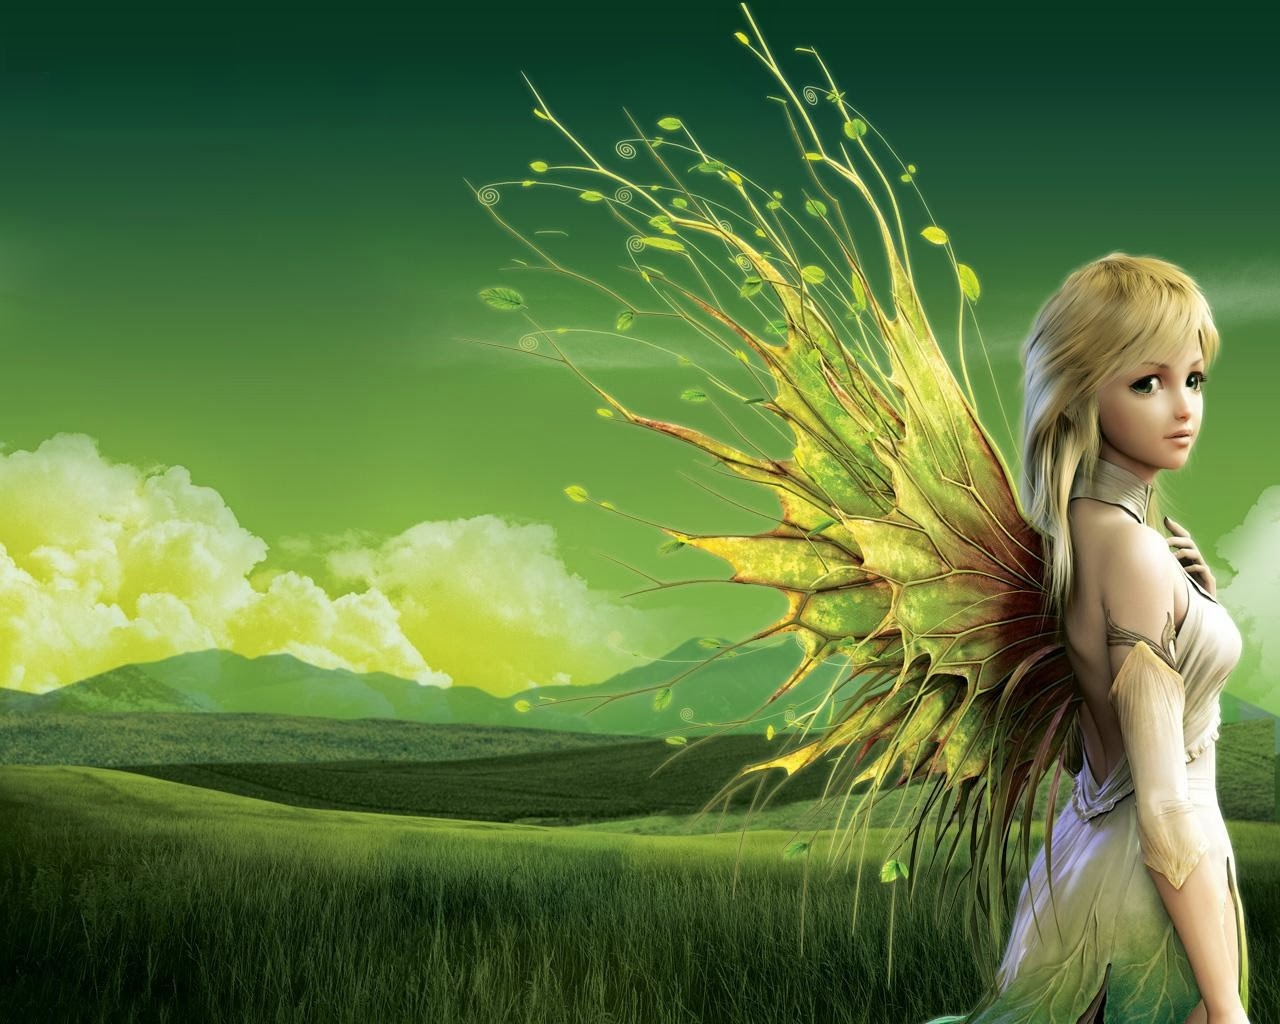 hd beautiful wallpapers fairy -#main